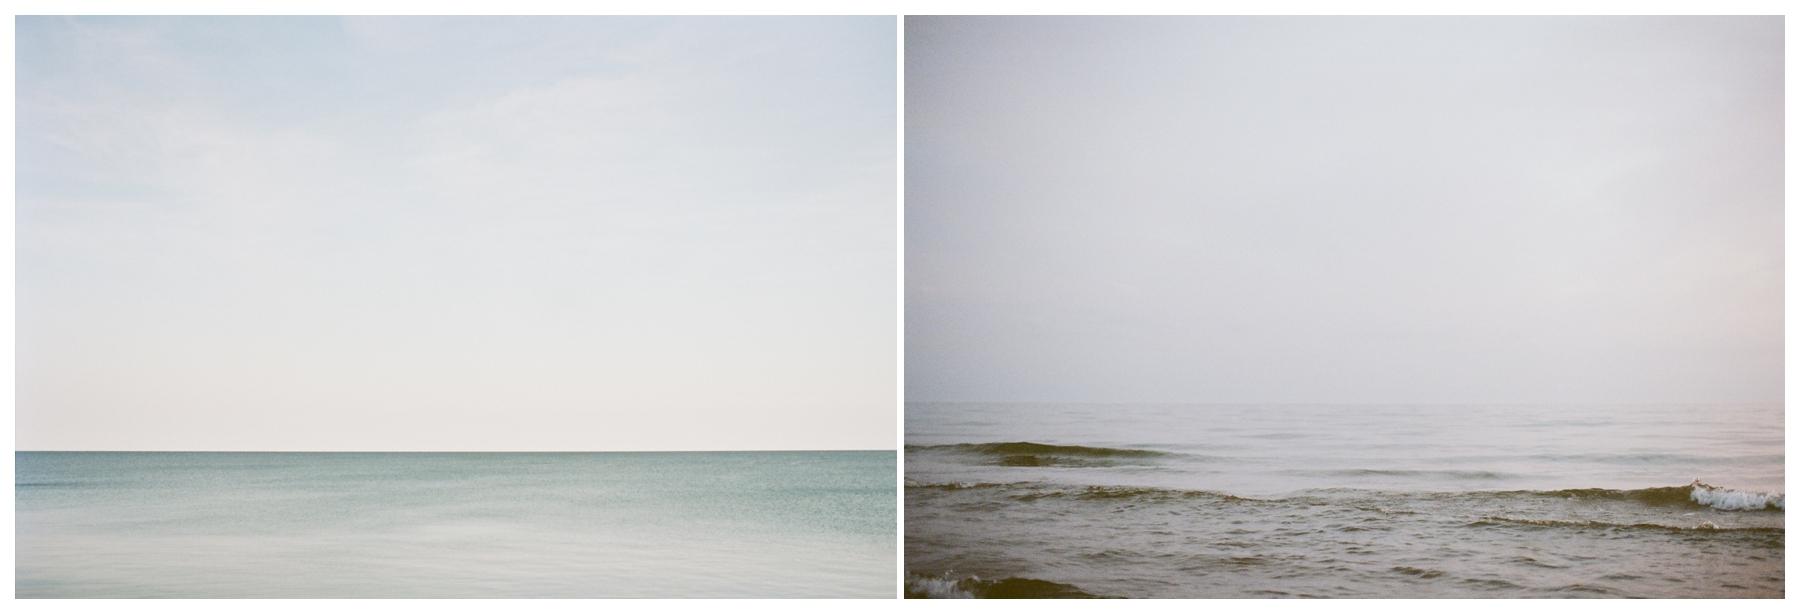 lake michigan, two days apart | lily glass